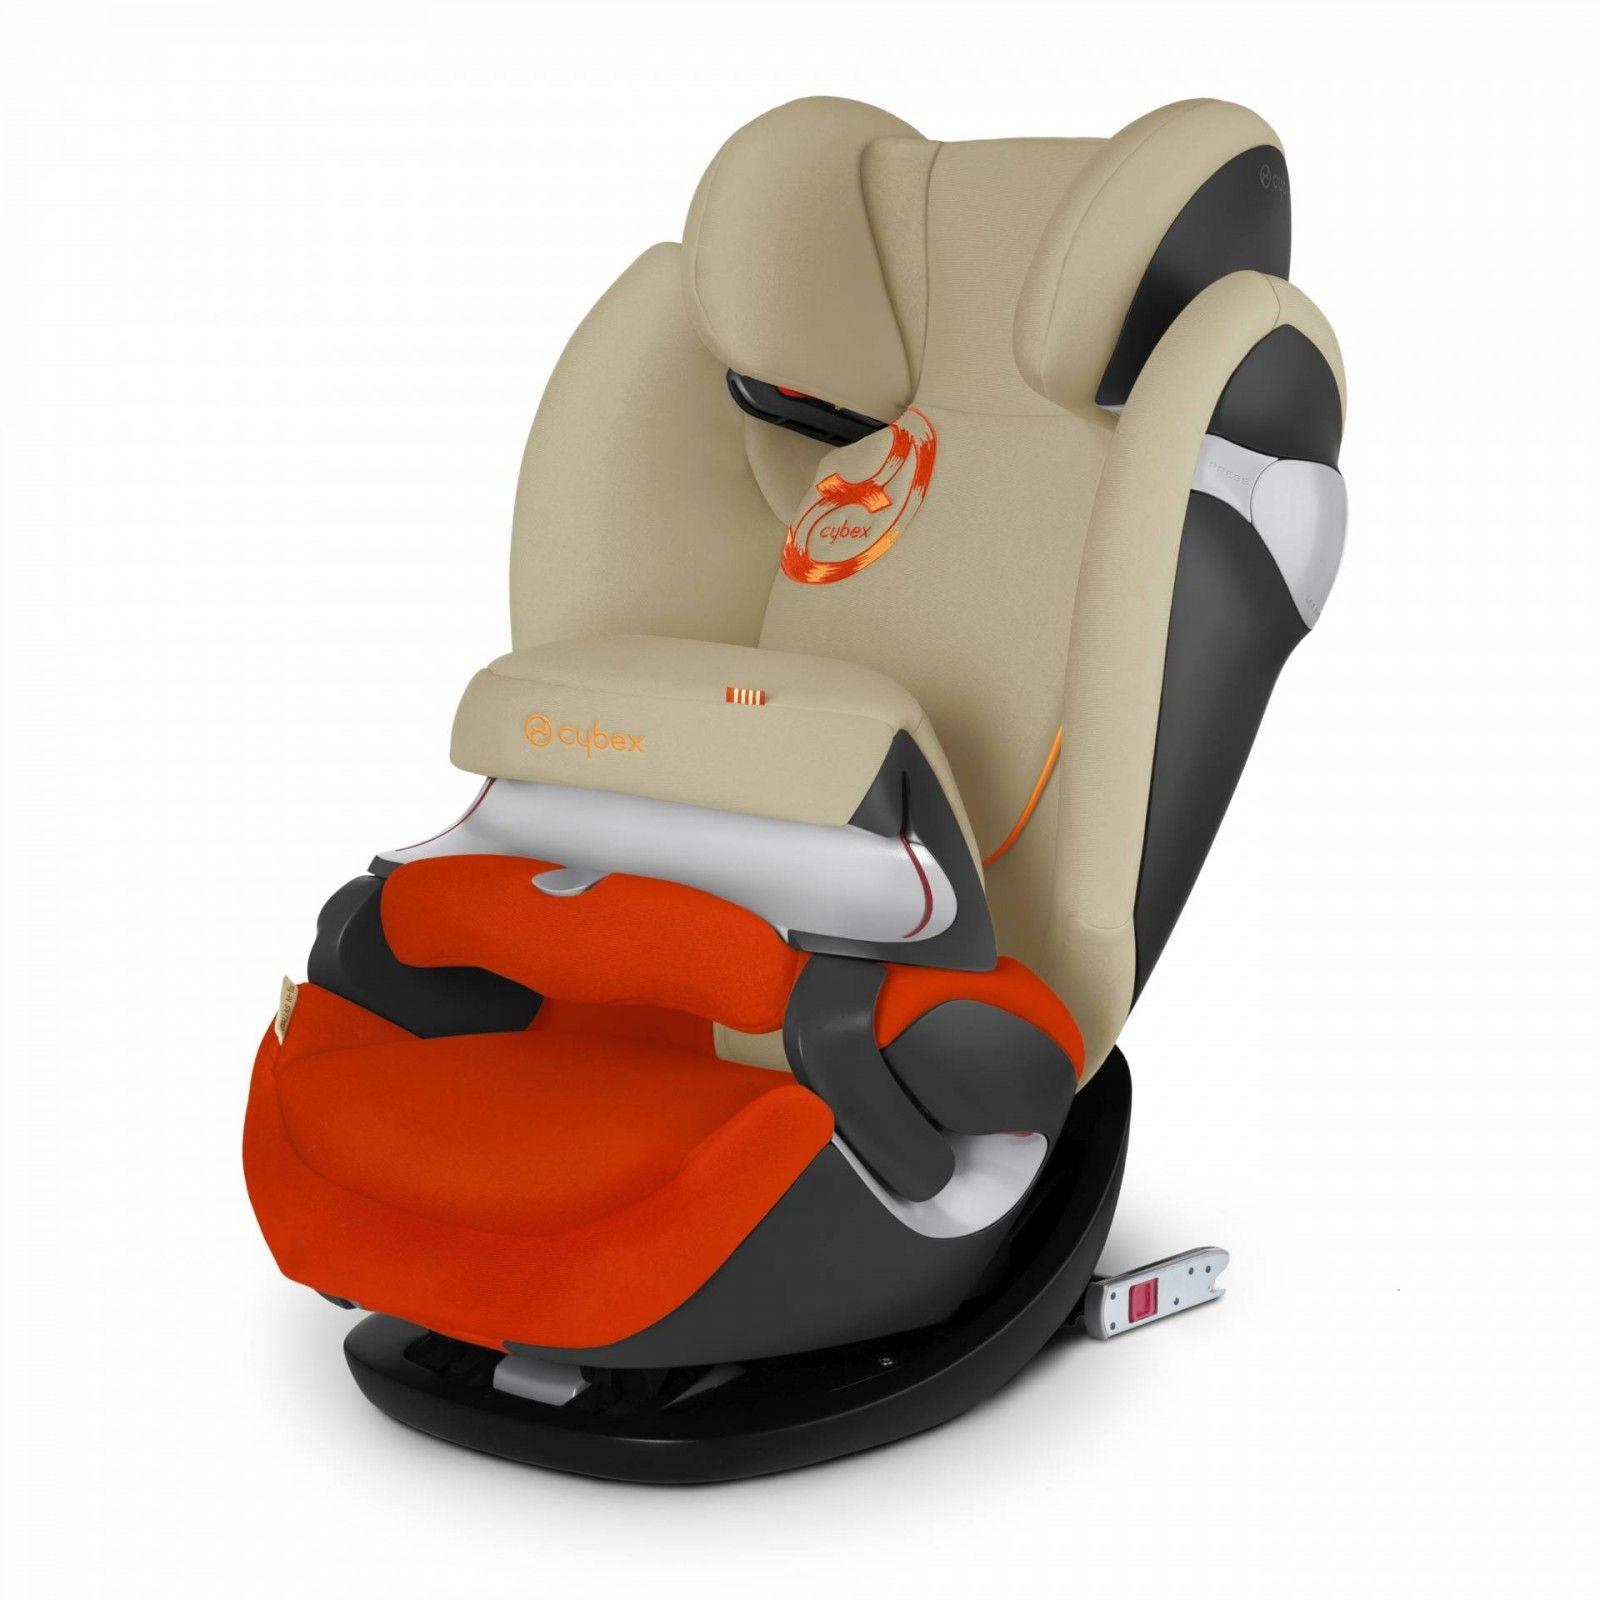 Comparing 5 Rockin Impact Shield Car Seats Toddler Car Seat Baby Car Seats Car Seats